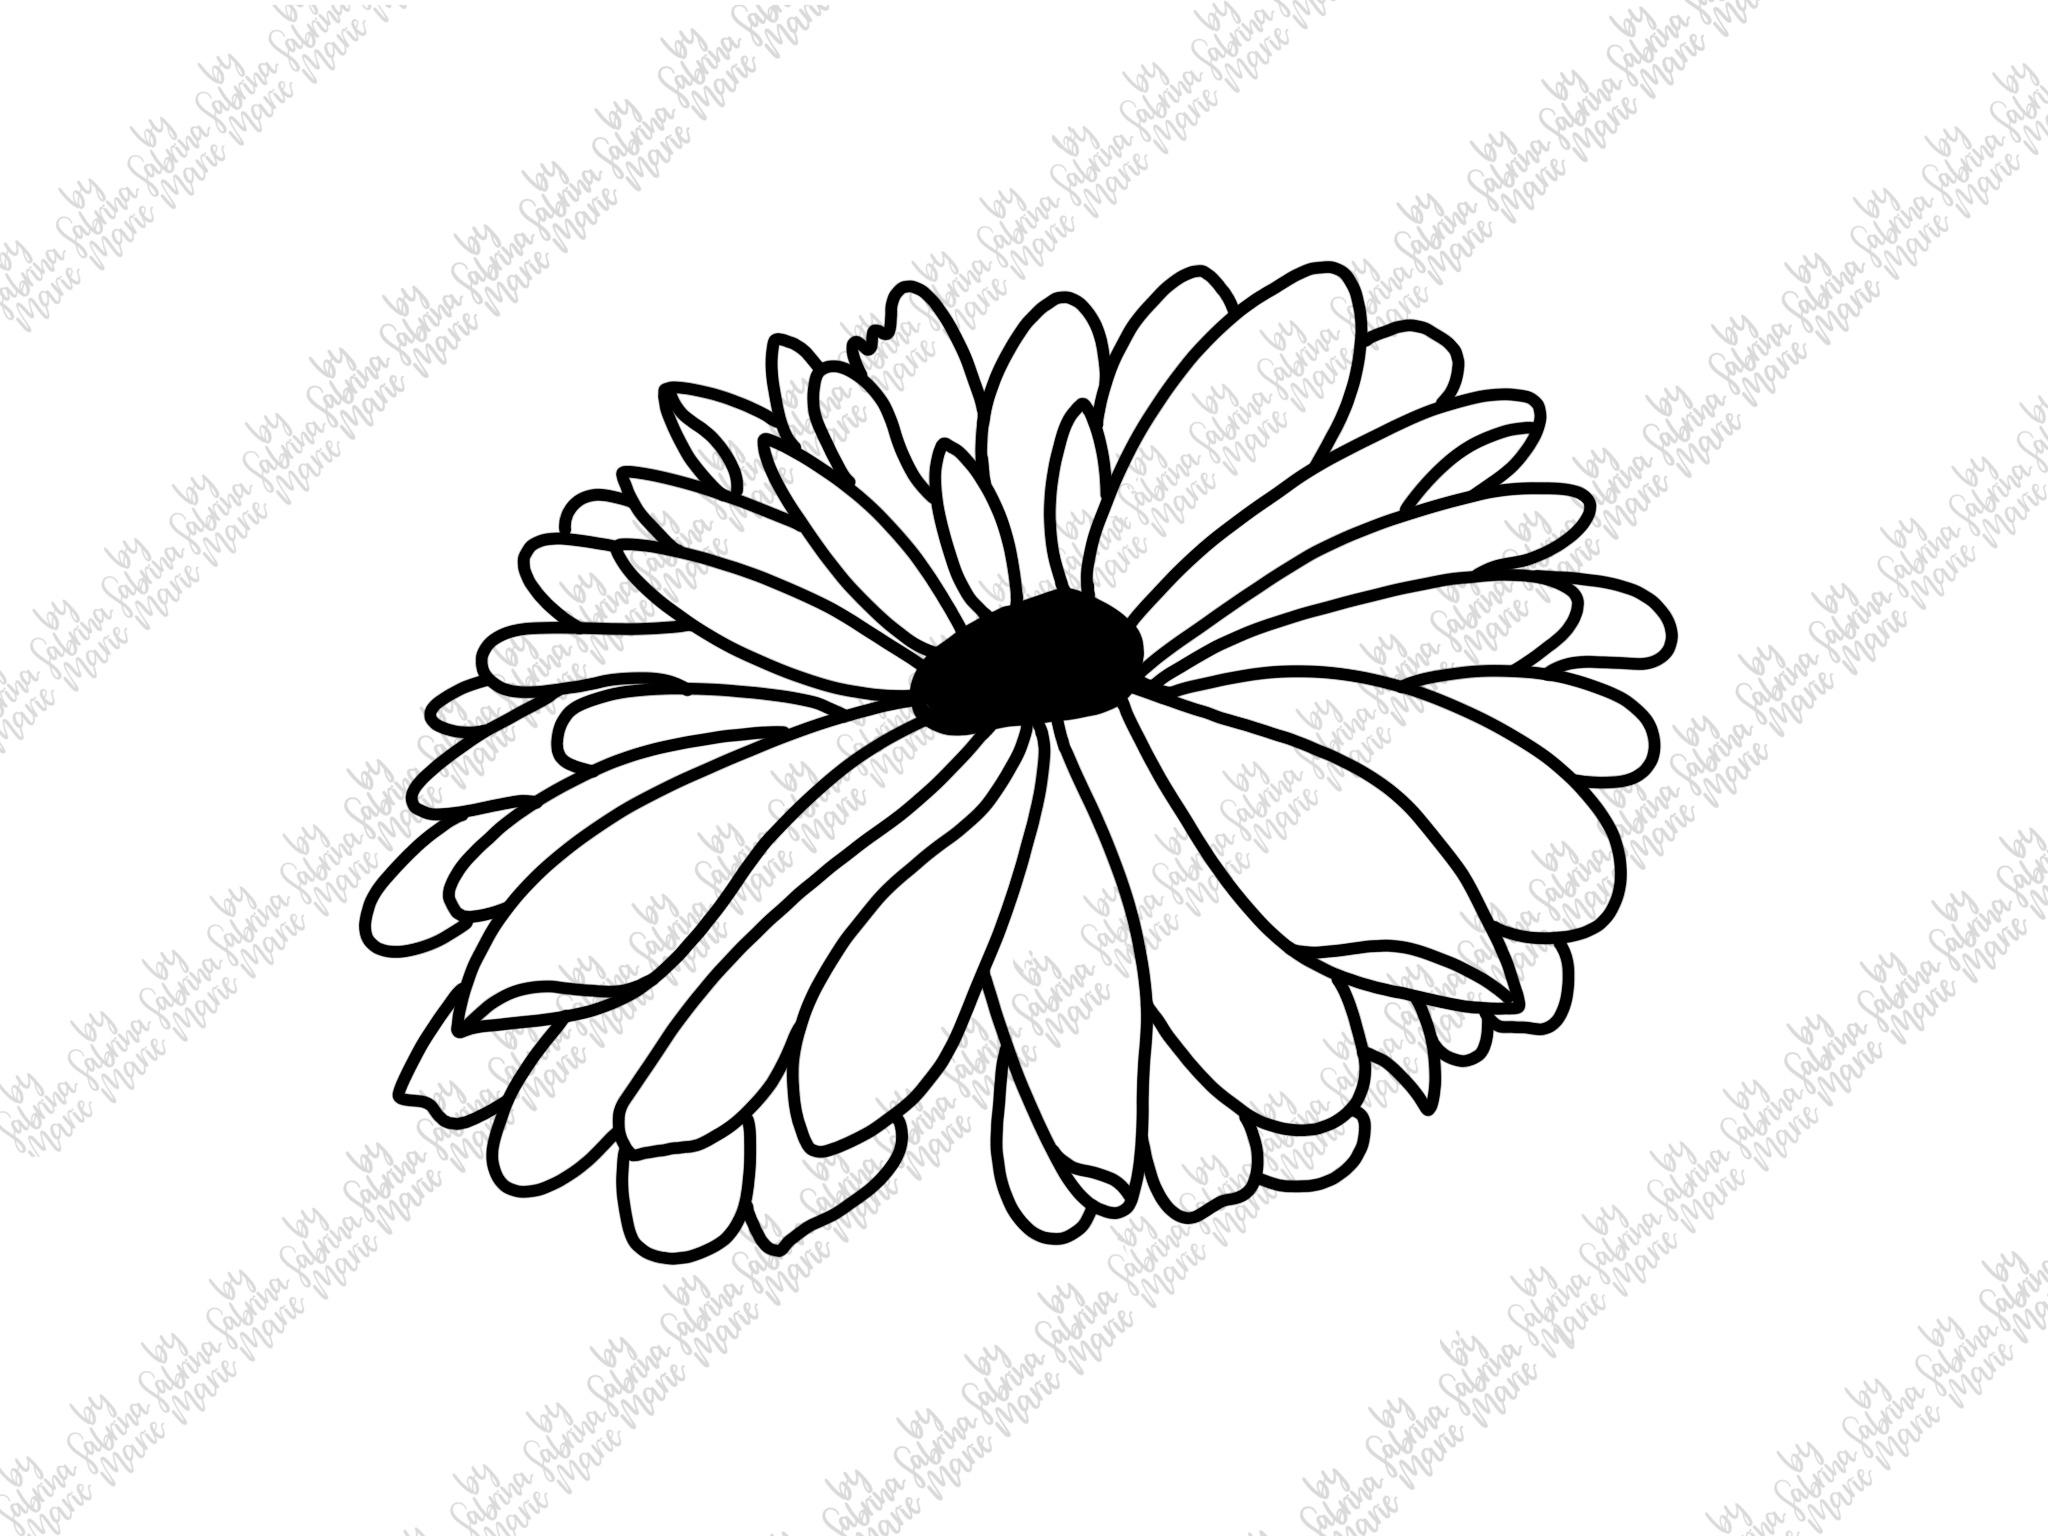 Daisy|Handdrawn Flower Cut File|Daisy Design|SVG|PNG